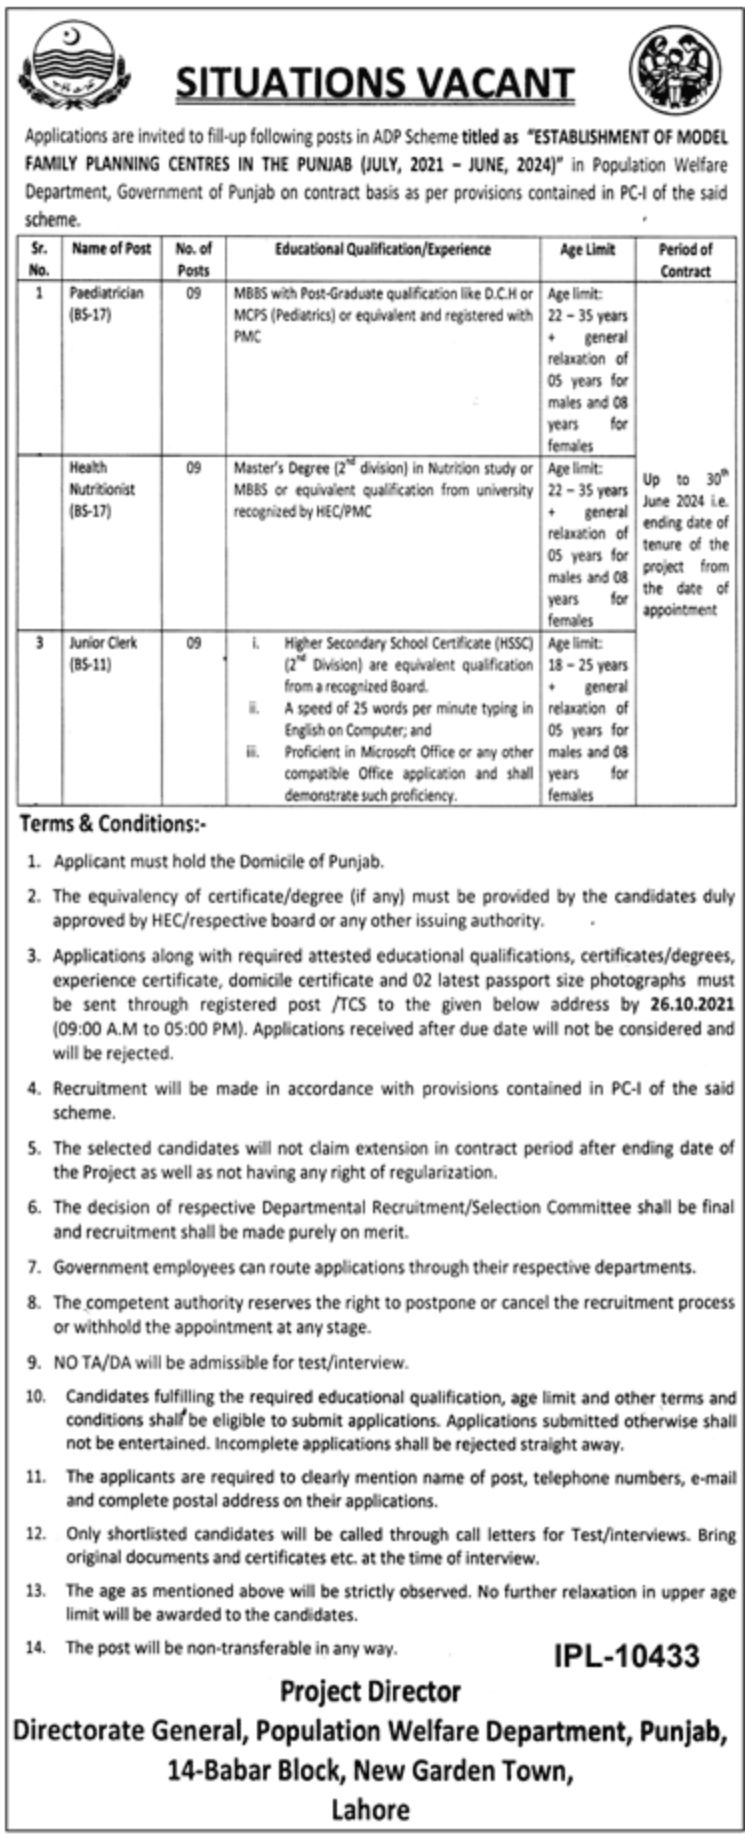 Establishment of Model Family Planning Centres Punjab Vacancies 2021 – Latest Jobs 3